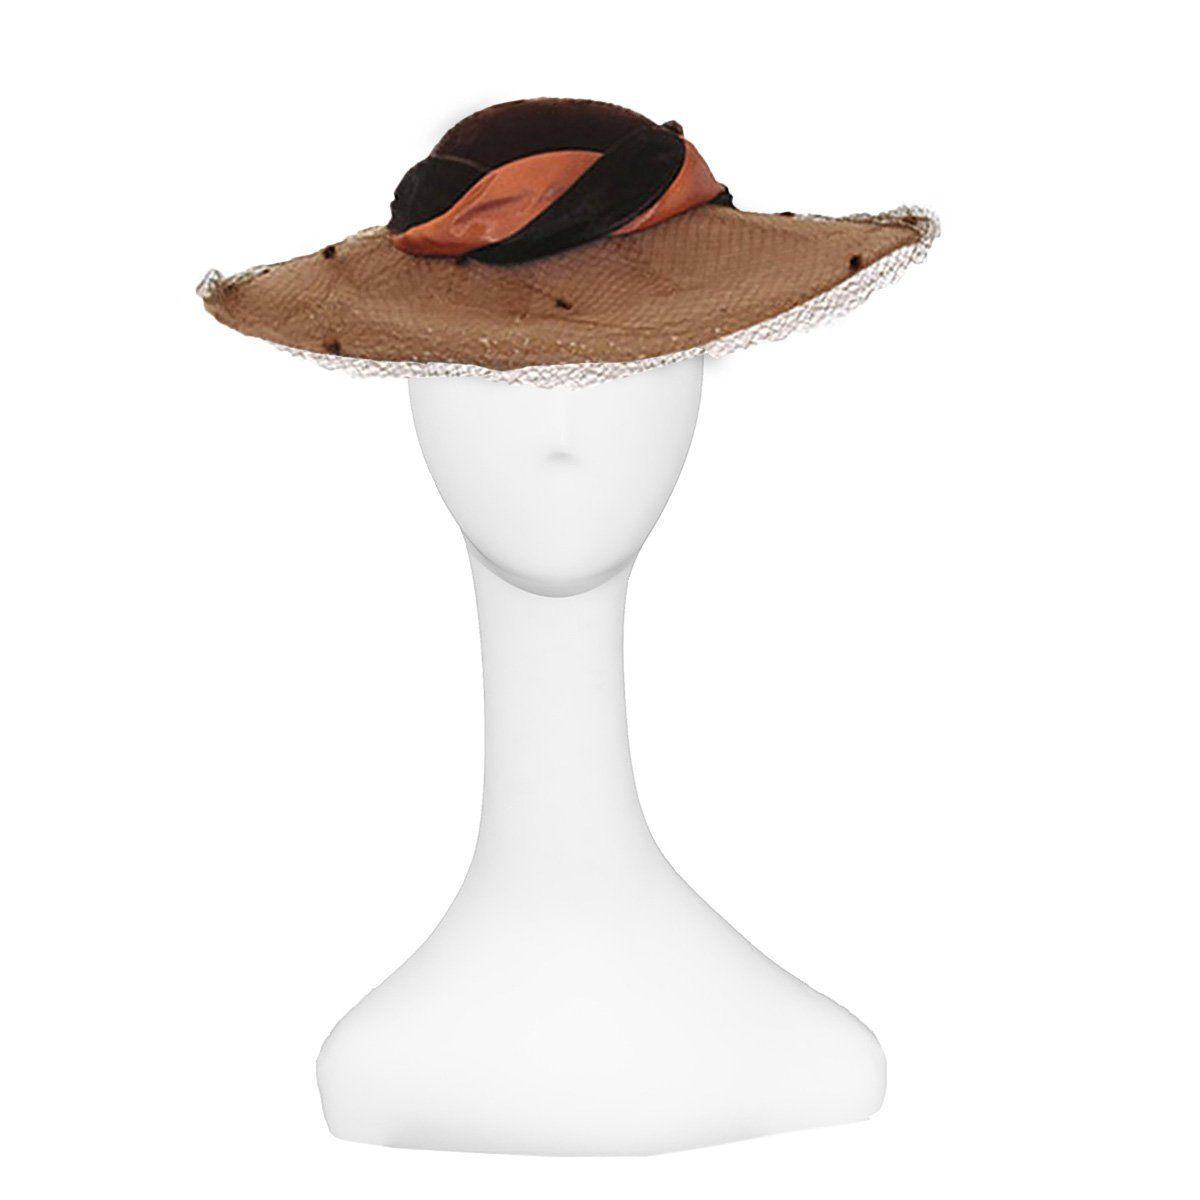 Whittall & Javits Brown Velvet & Wool Felt Wide-brim Hat with Netting, Hat Size 22